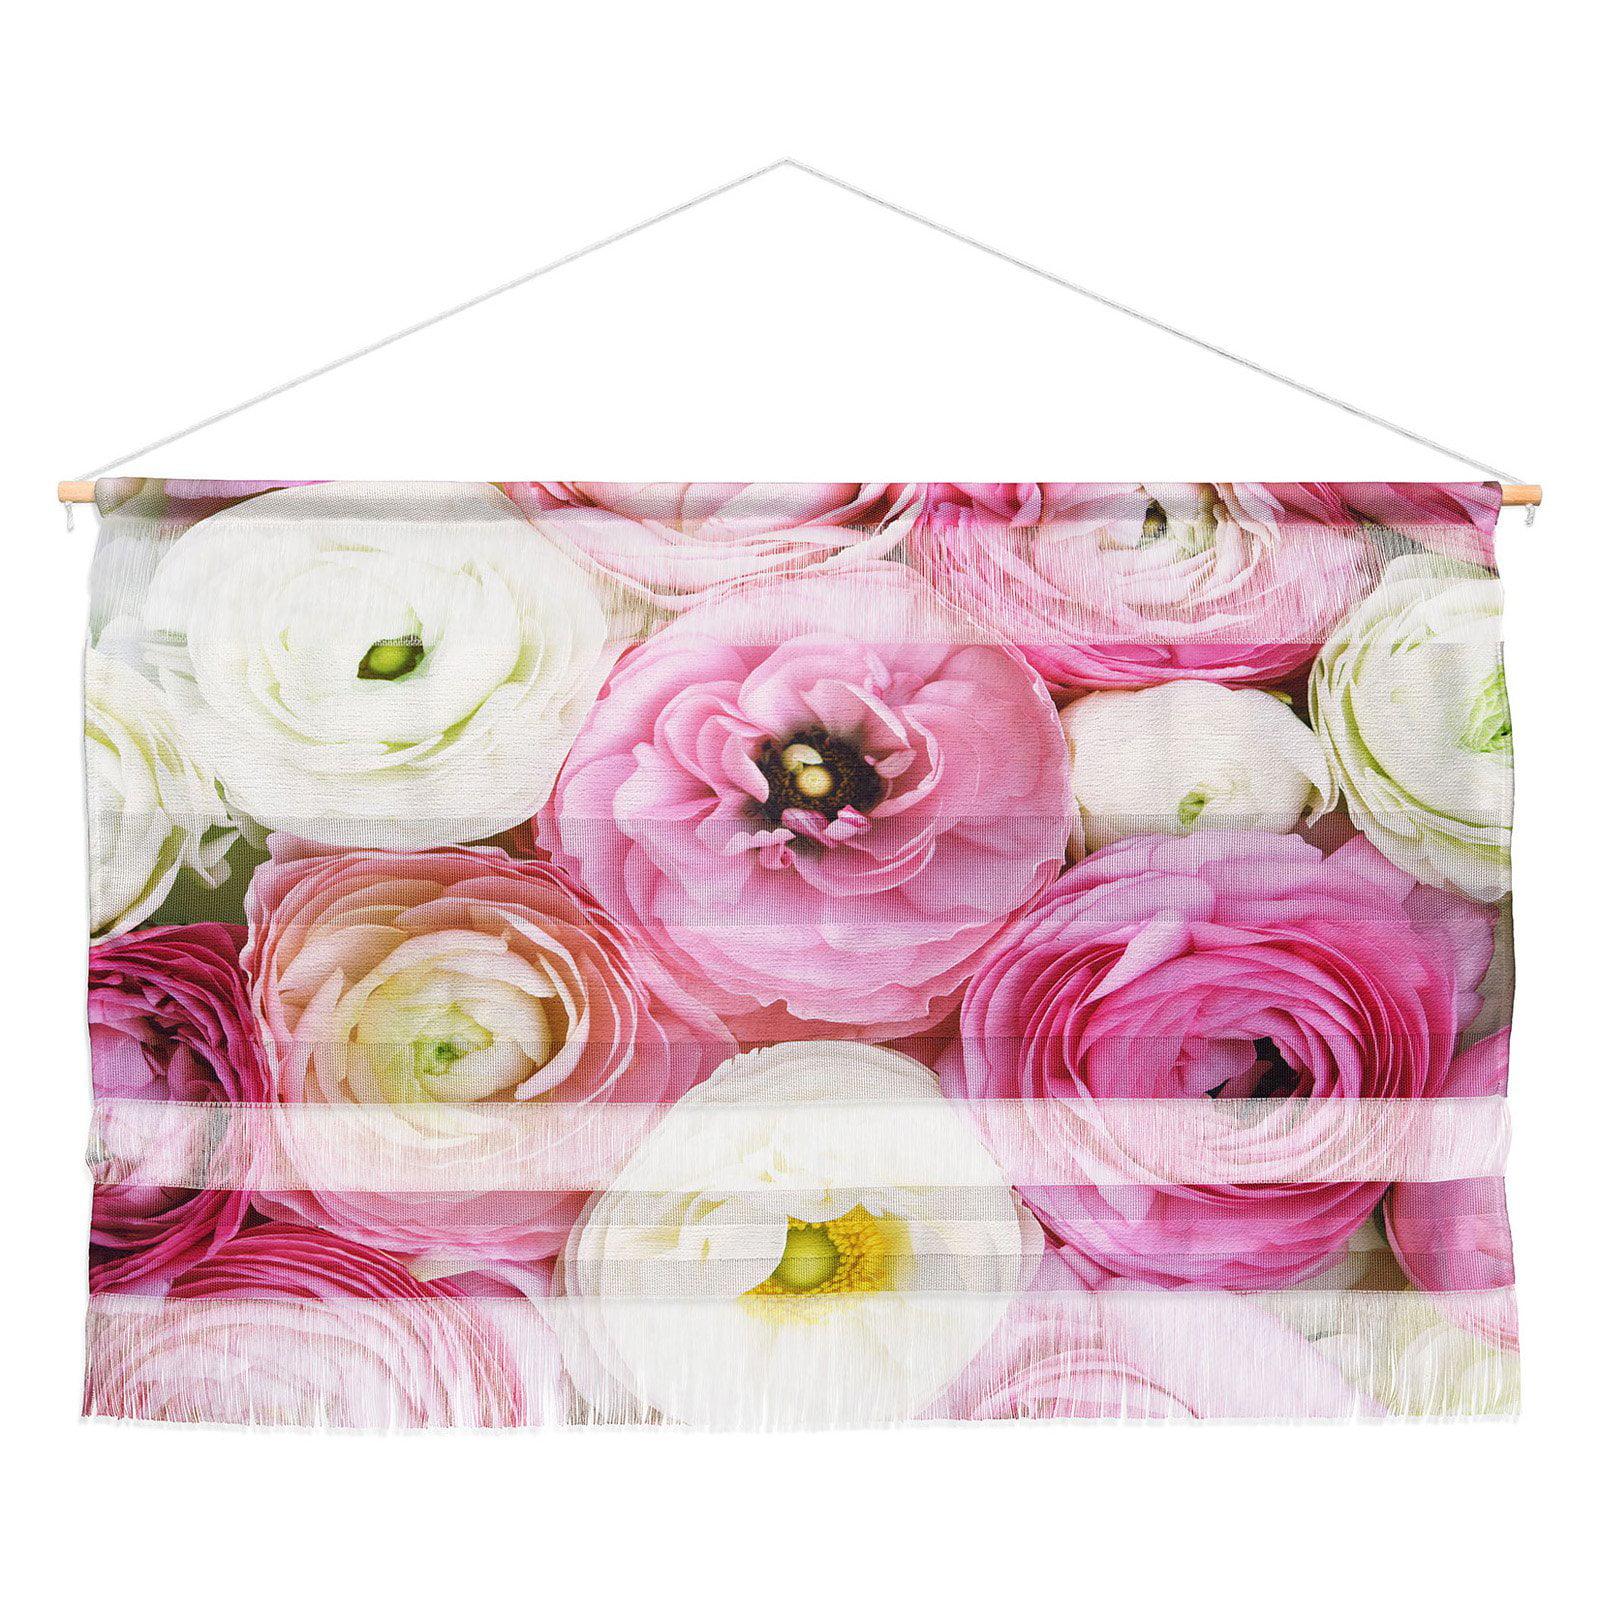 Deny Designs Bree Madden Pastel Floral Wall Scroll Walmart Com Walmart Com